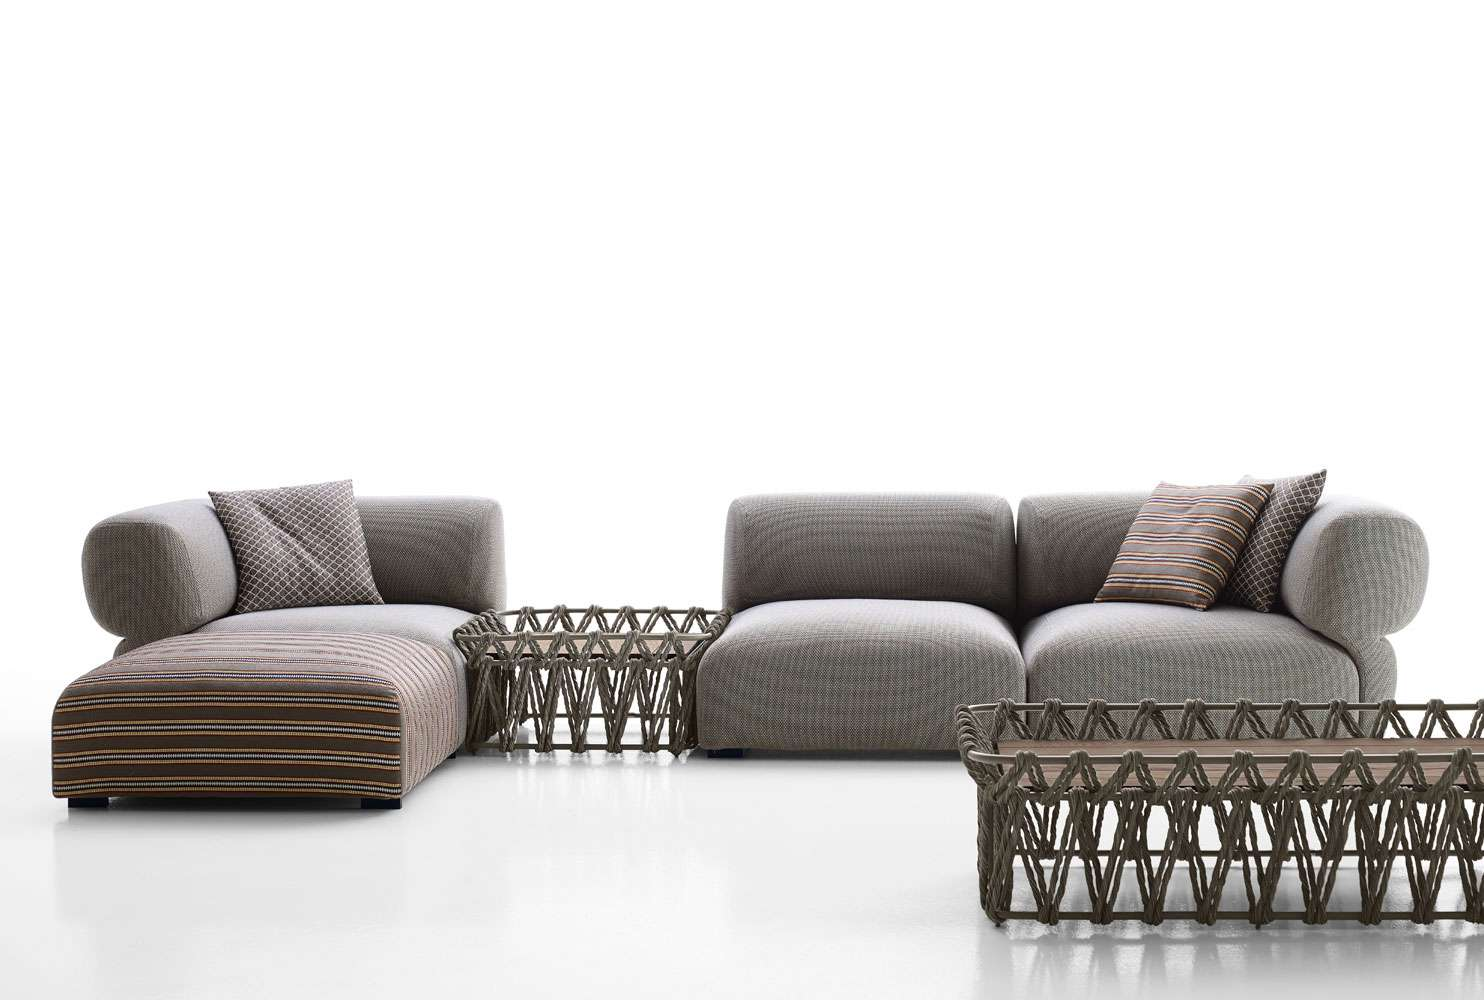 Squarcina b b italia outdoor butterfly sofa squarcina for B and b italia outdoor